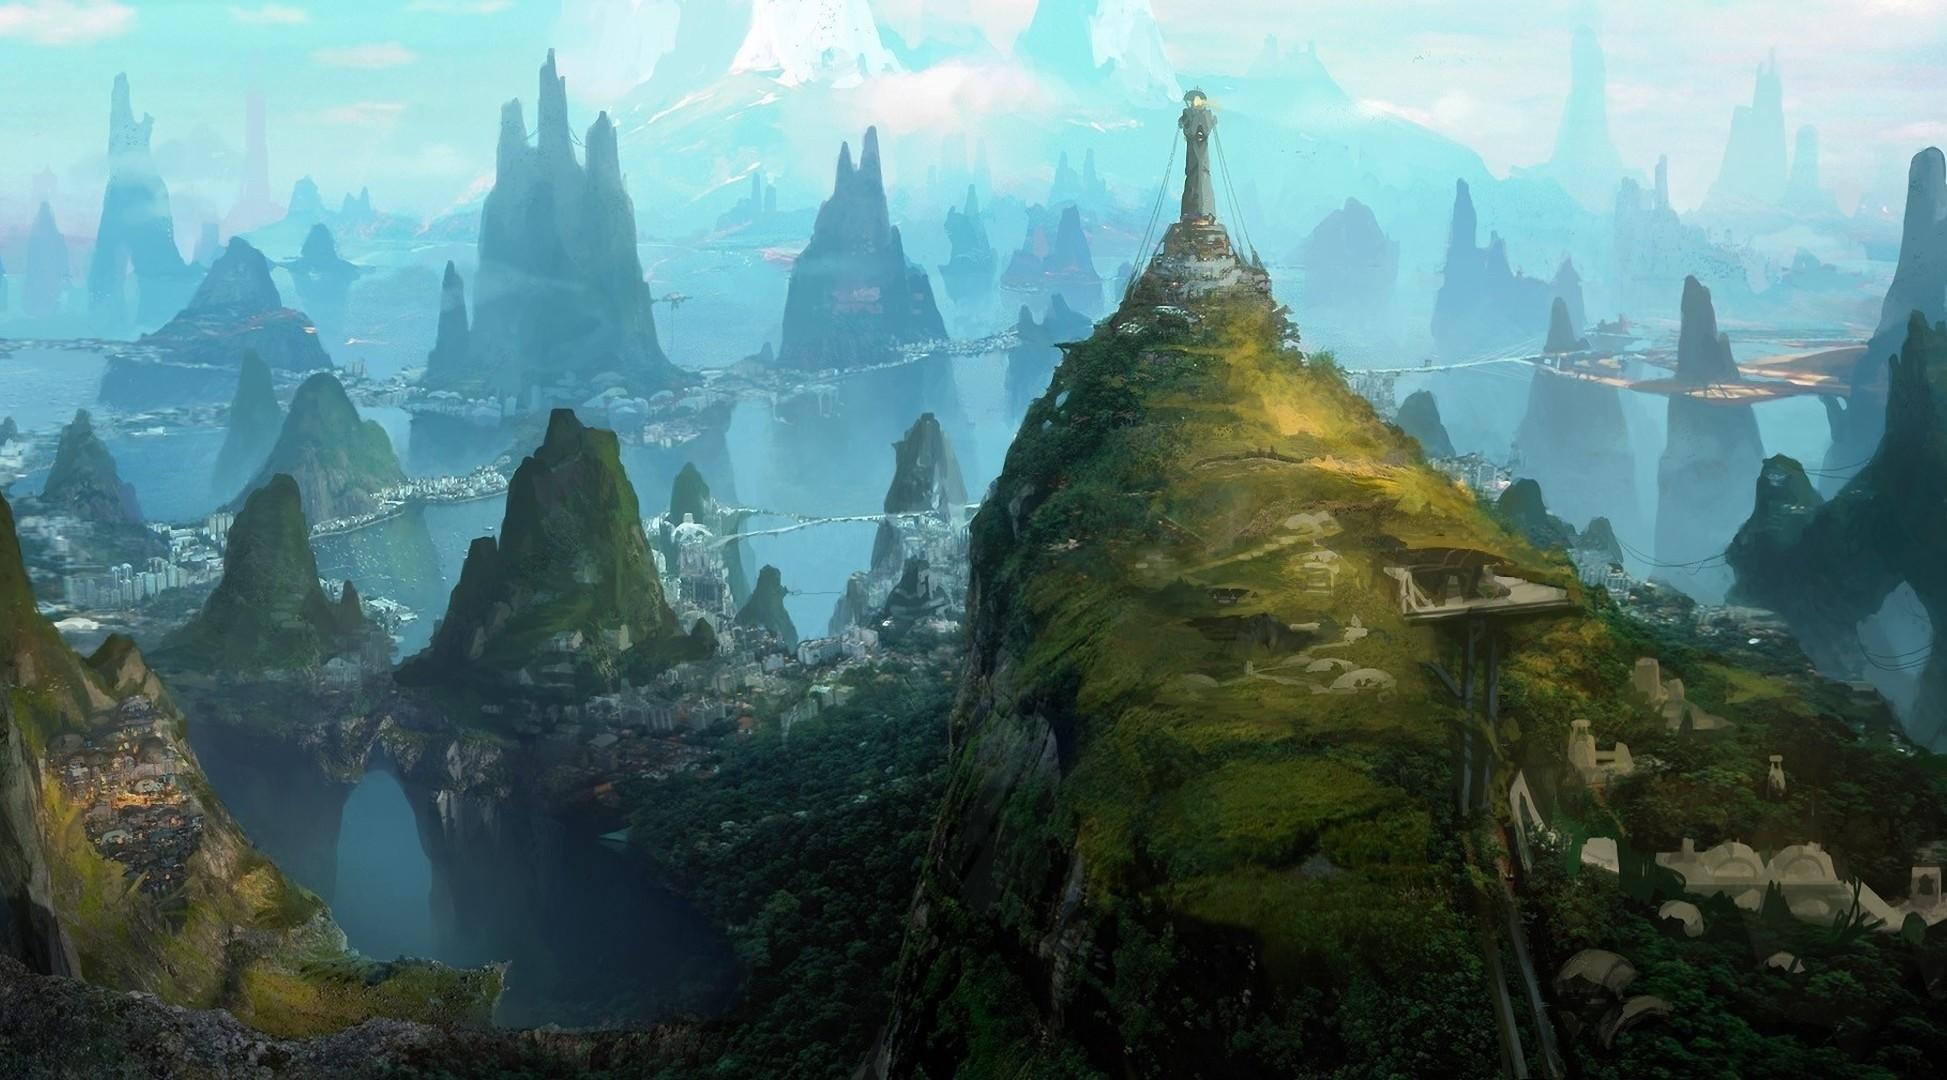 Fantasy Landscape Wallpapers 1080p